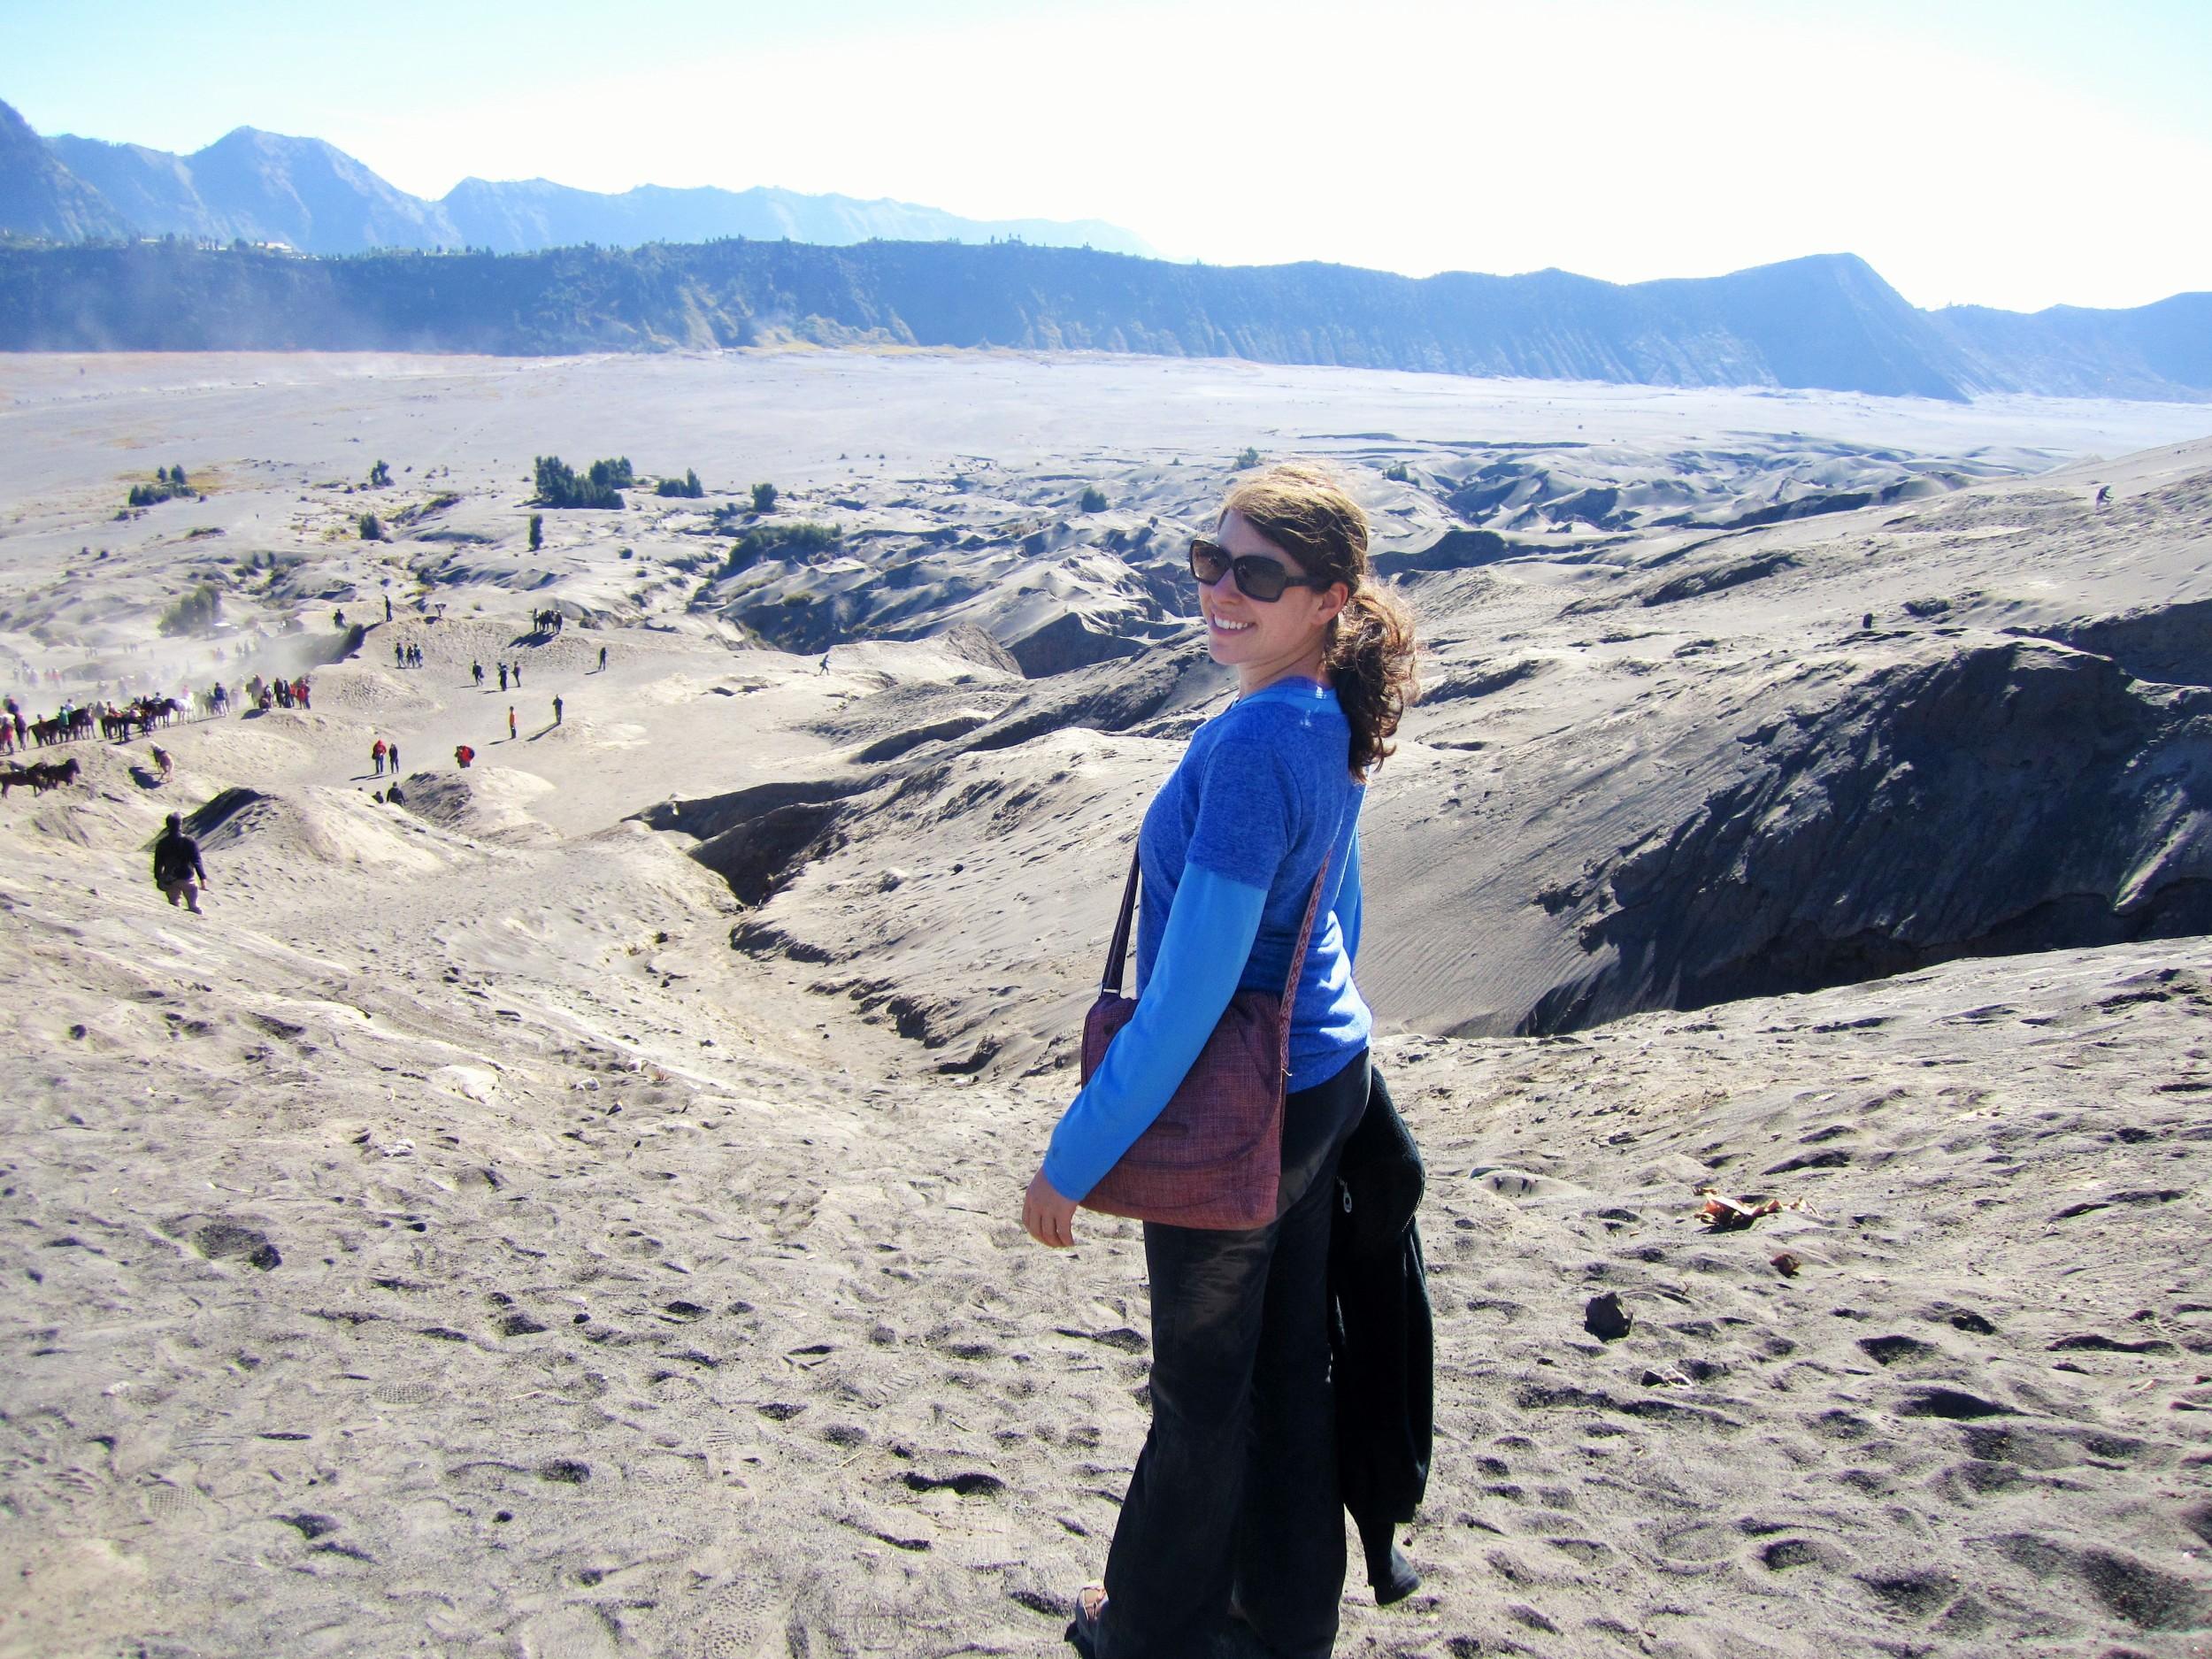 Walking through the sea of sand post climbing Mt. Bromo, part of the Tengger Massif